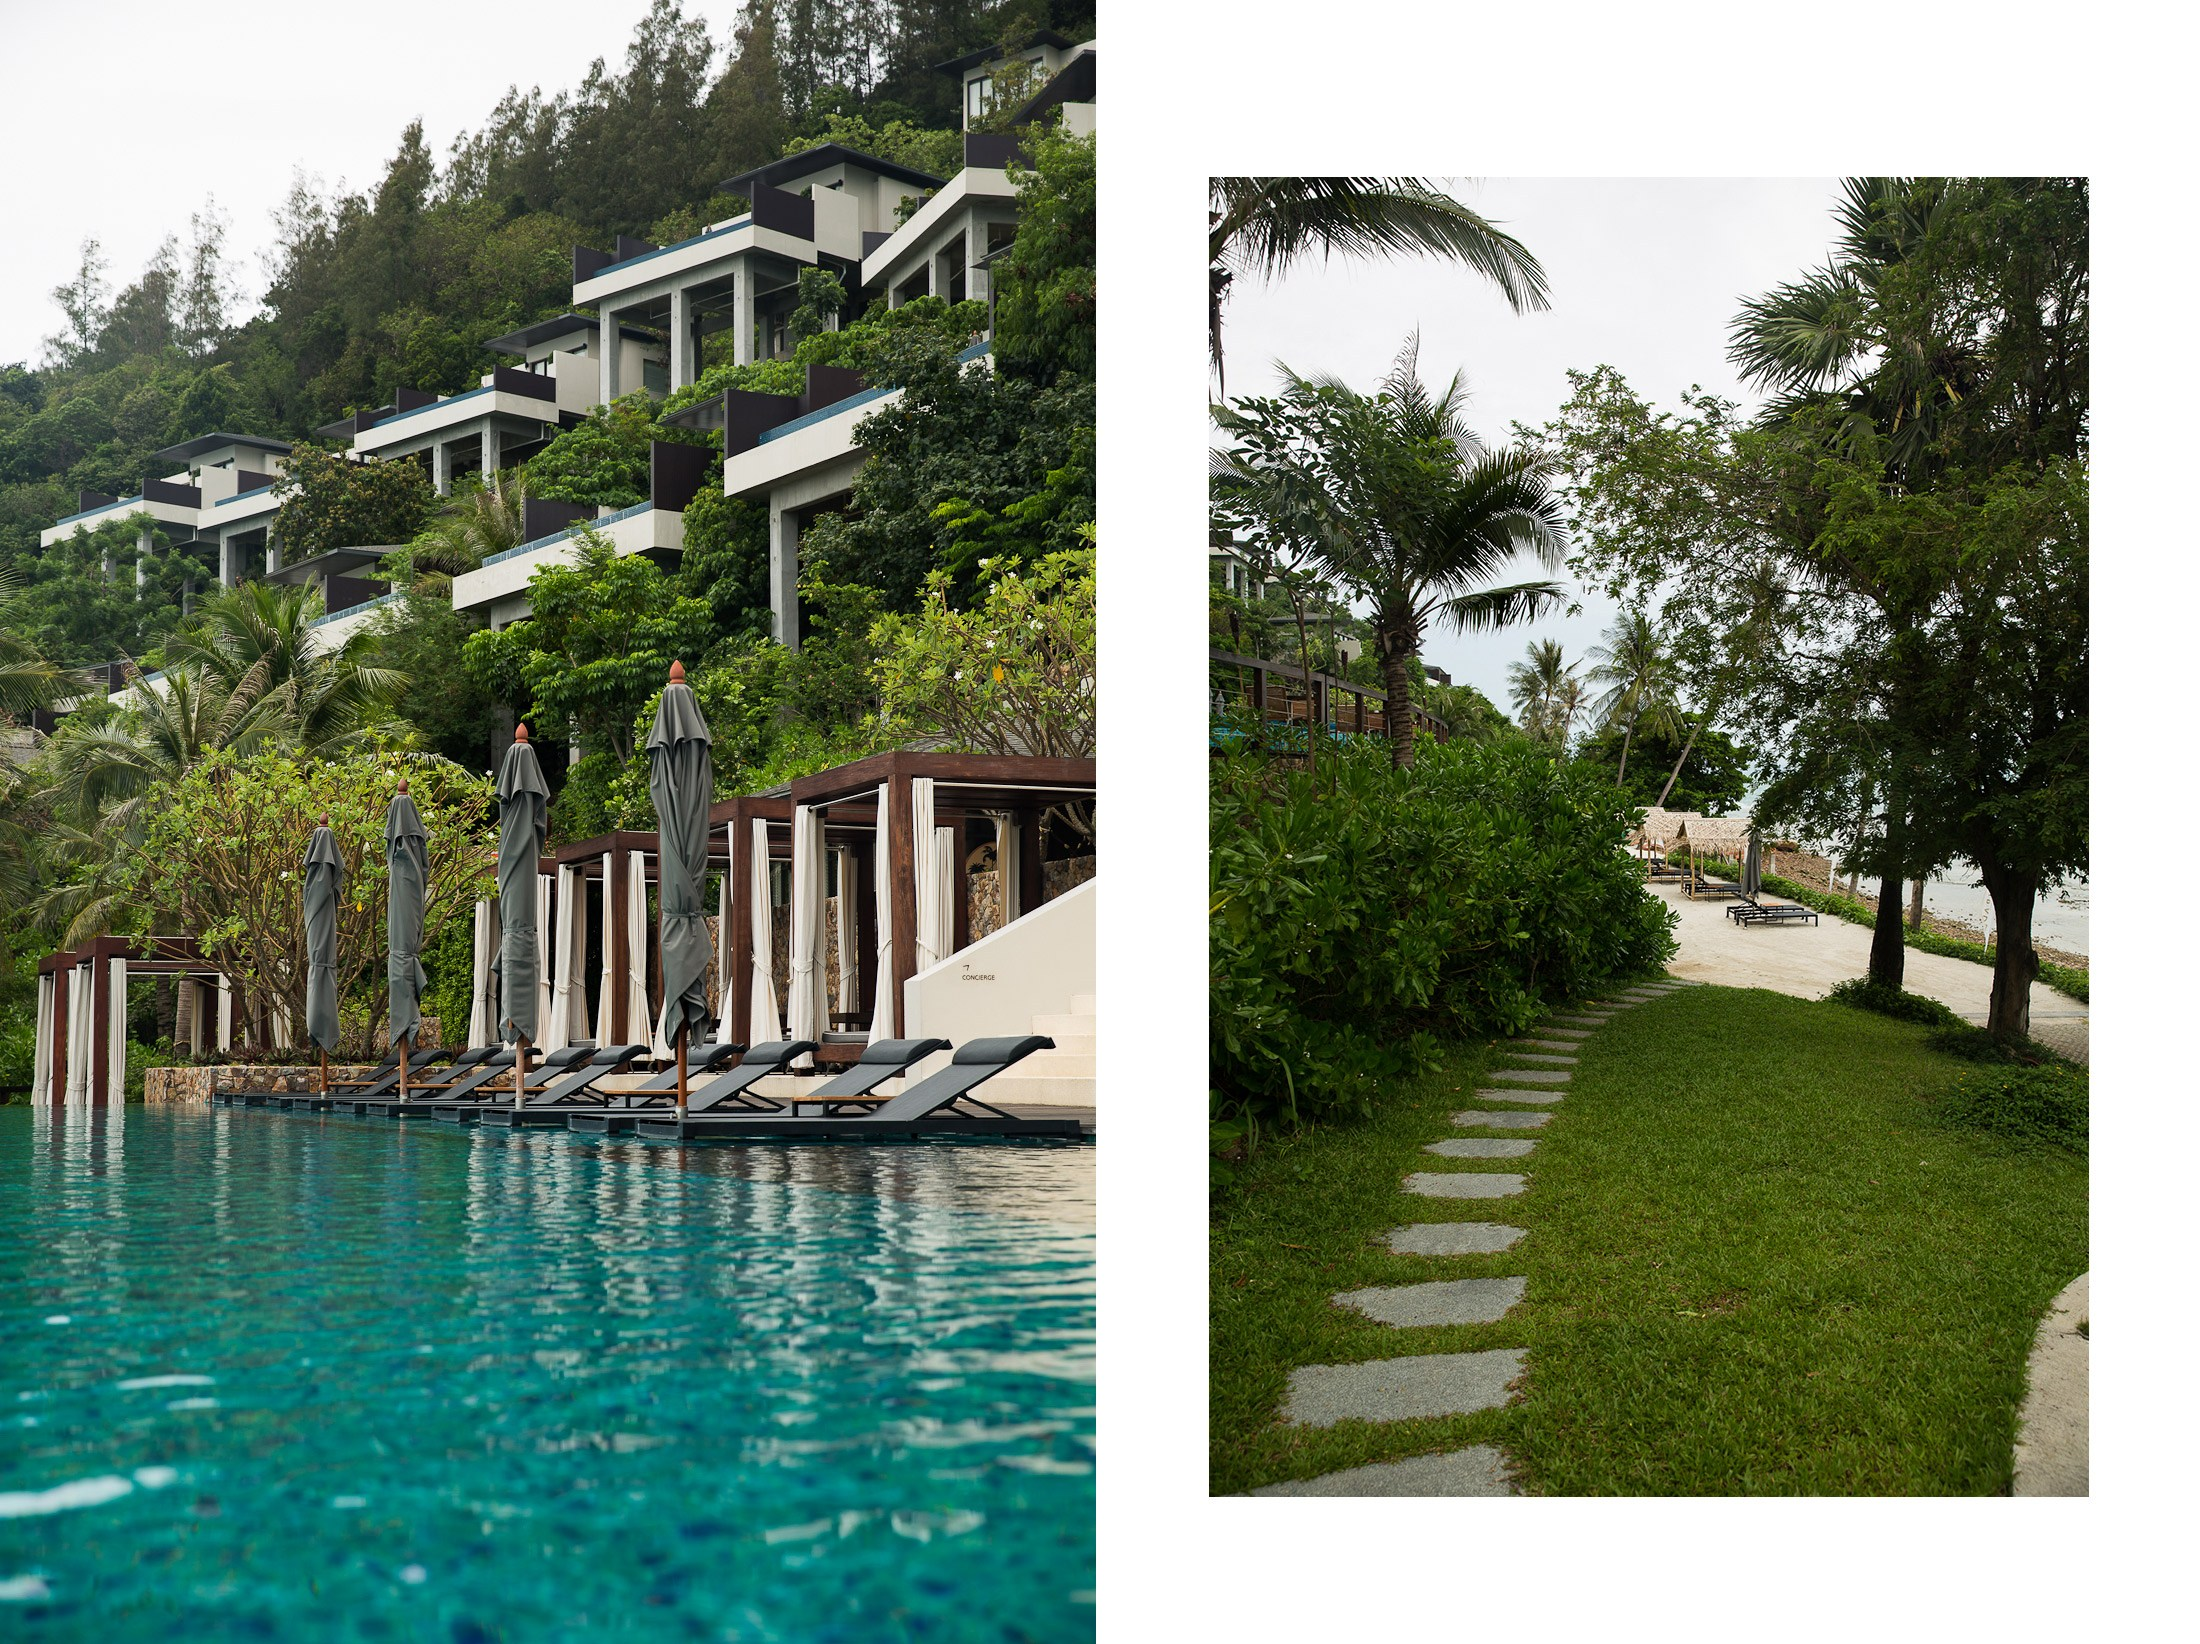 conrad koh samui hotel resort thailand samui island paradise vacation infinity pool beach villa hut rocky sun summer vacation shershegoes.com